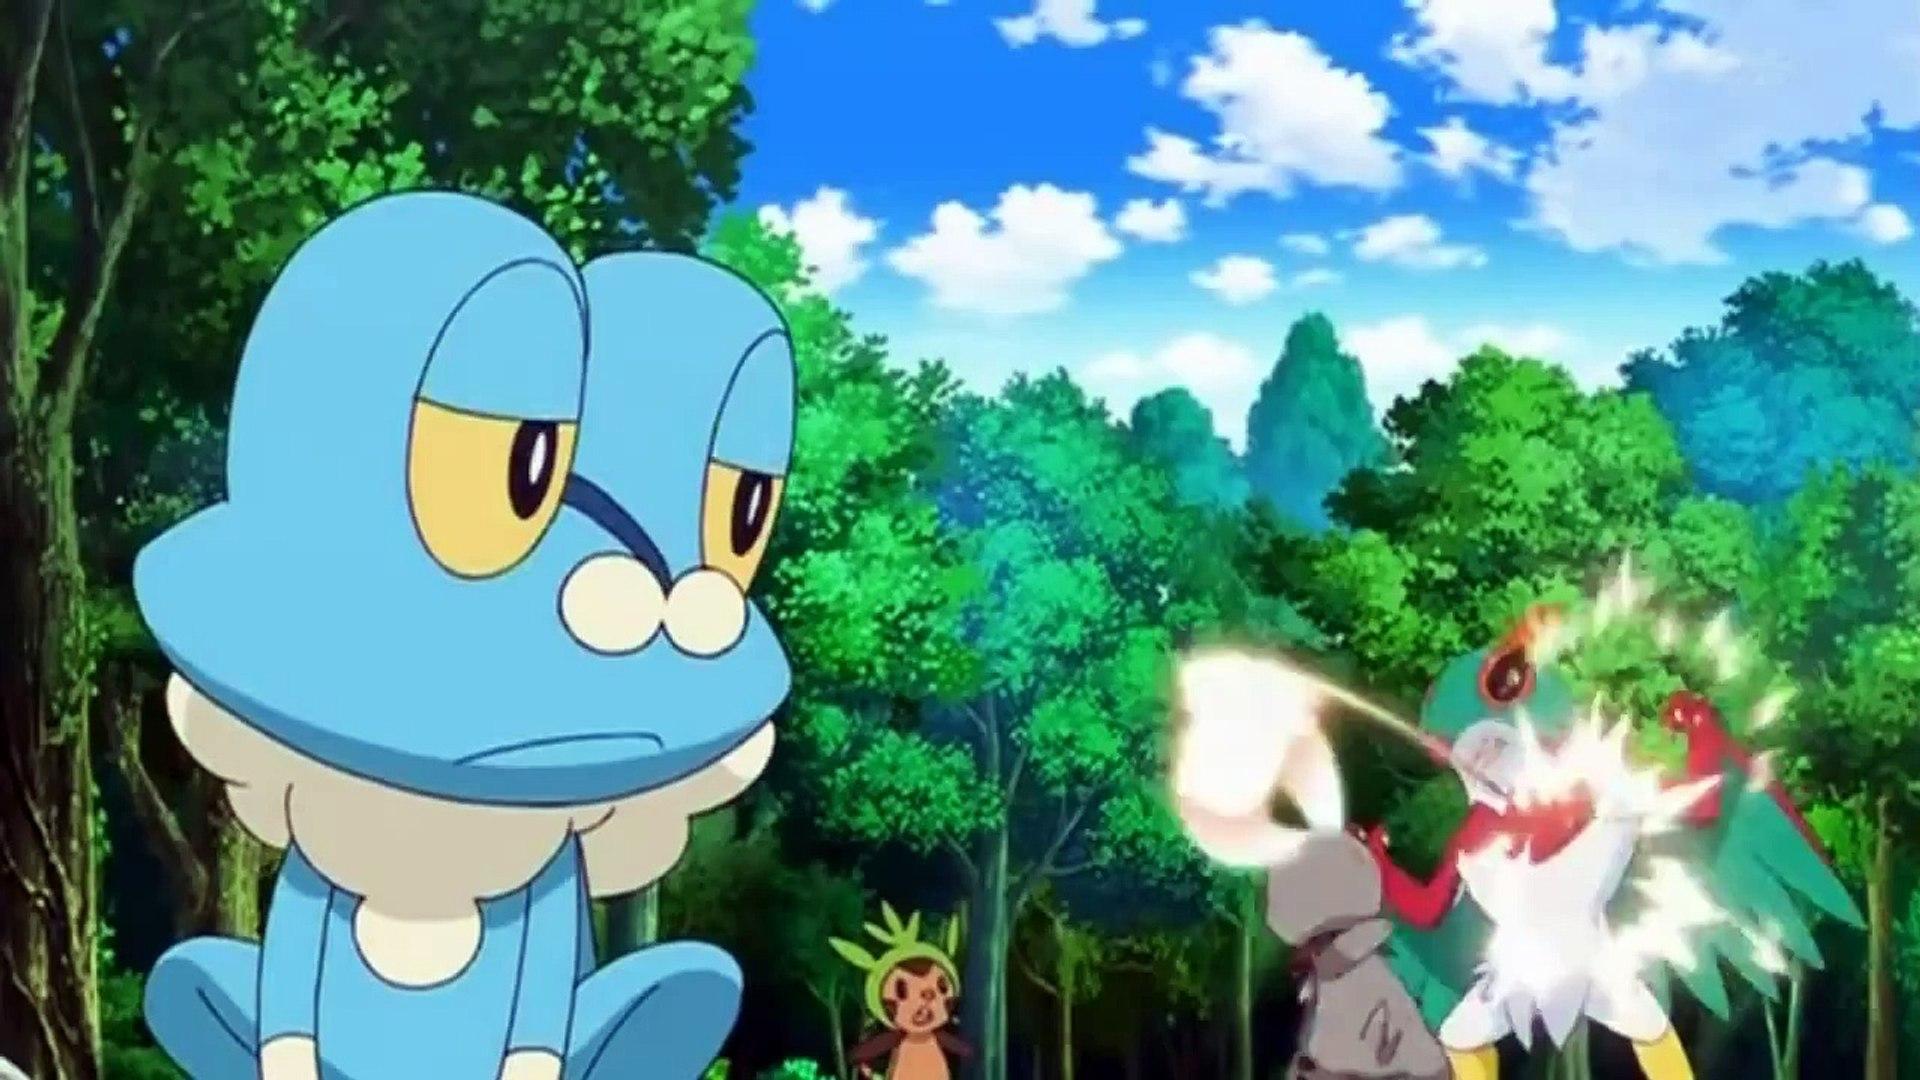 Pokemon Images: Pokemon Xy Pikachu Vs Bunnelby